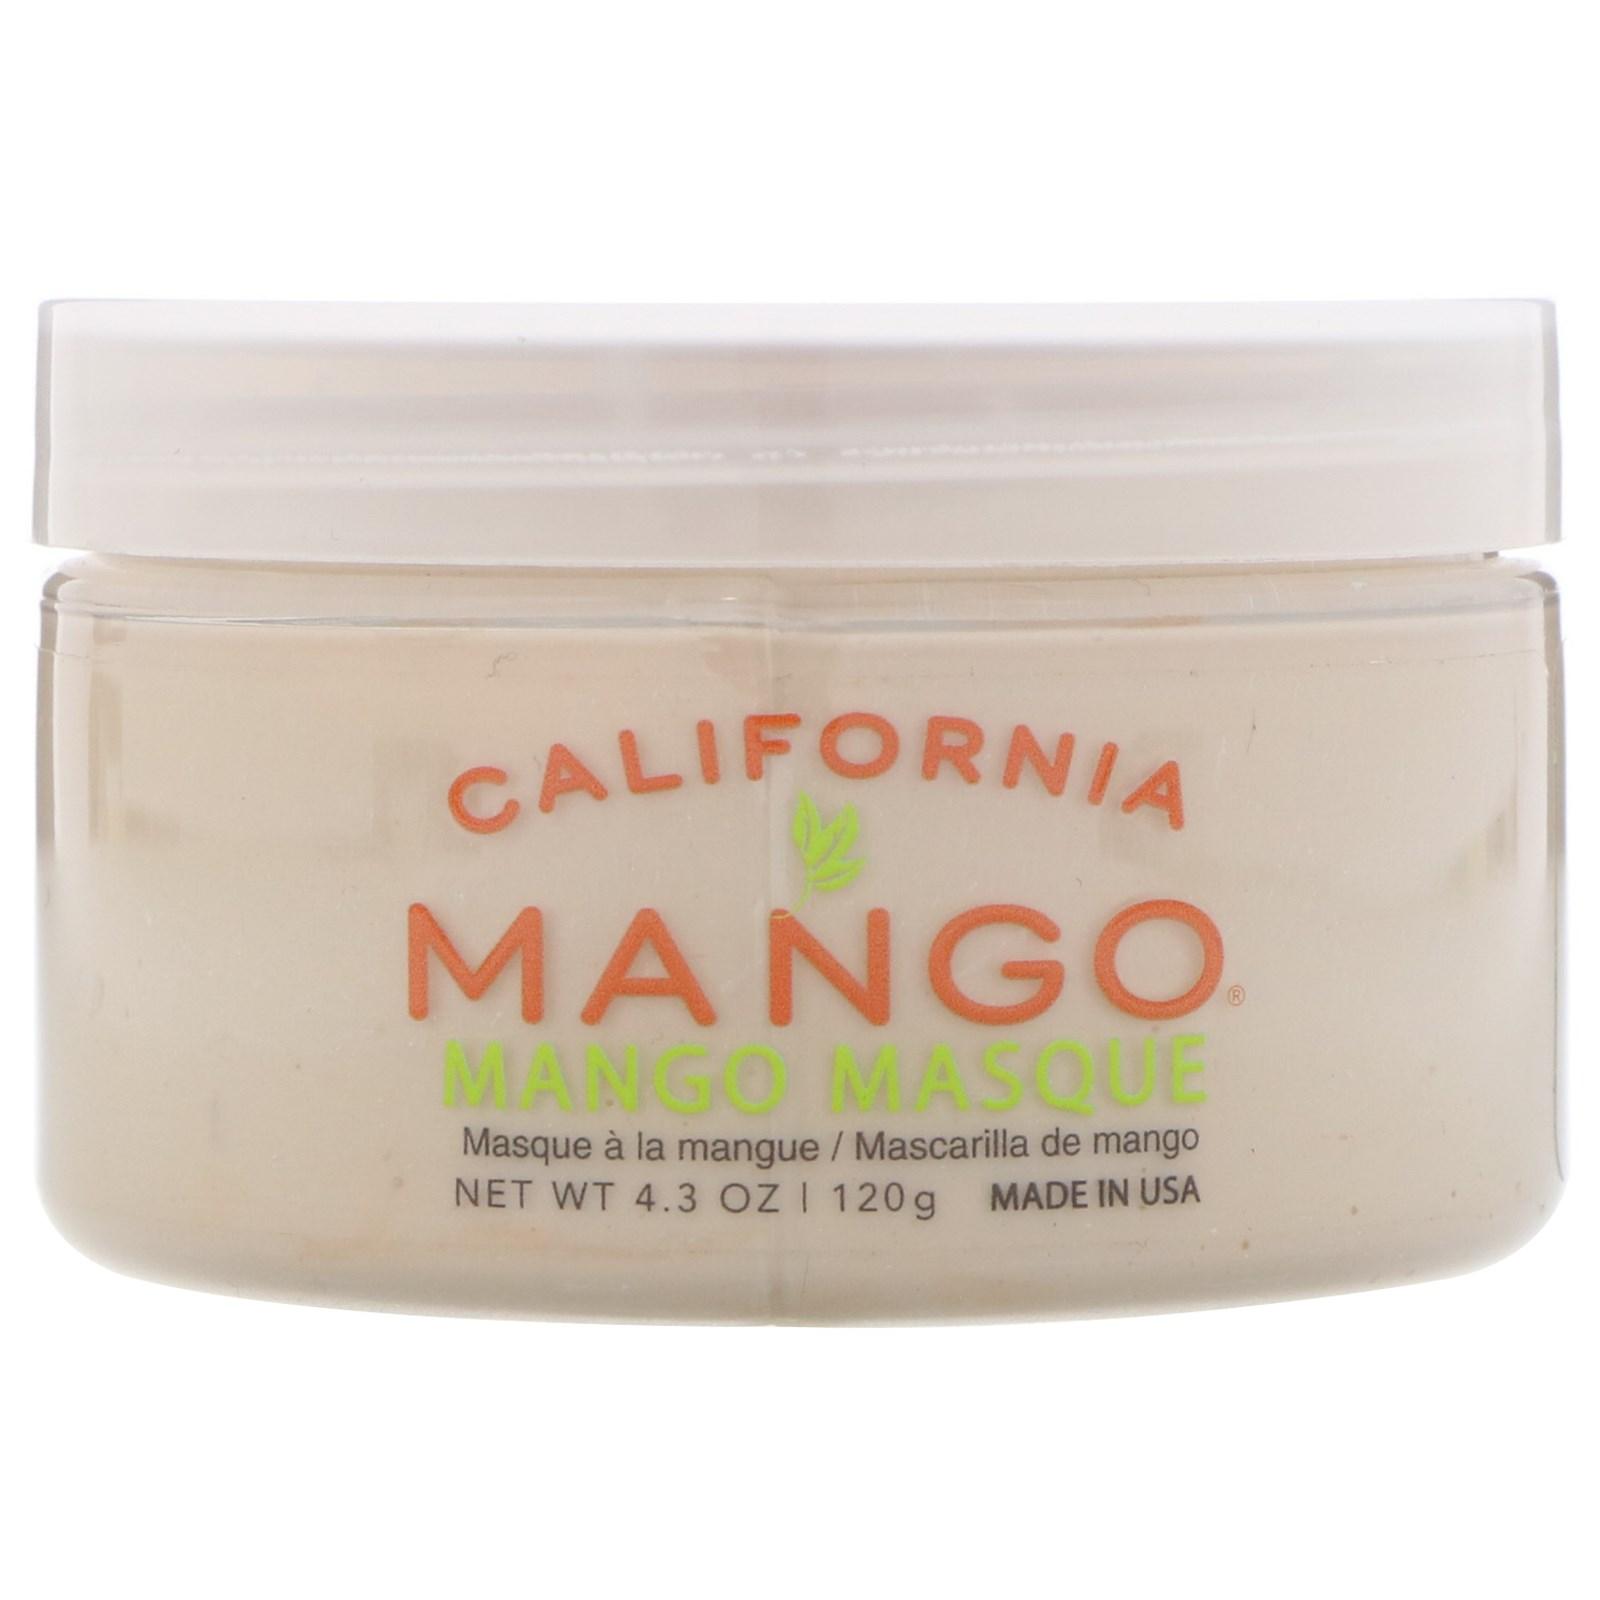 California Mango, Mango Masque, 4.3 oz(pack of 3) 3 Pack - Shiseido Future Solution Lx Eye and Lip Contour Regenerating Cream for Unisex 0.54 oz